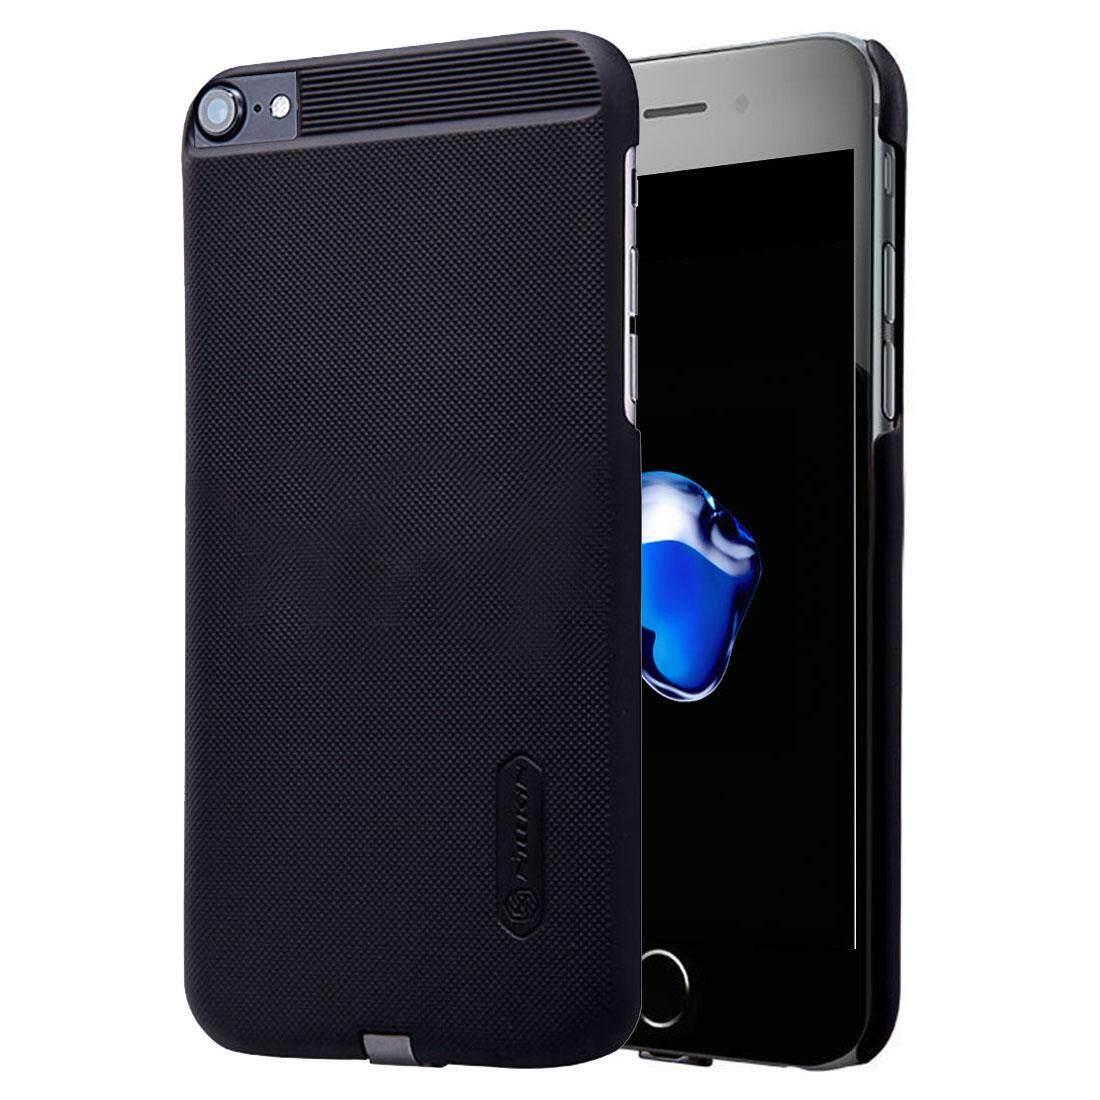 Untuk NILLKIN 2 In 1 Magic Case untuk iPhone 8 & 7 Anti-Slip PC